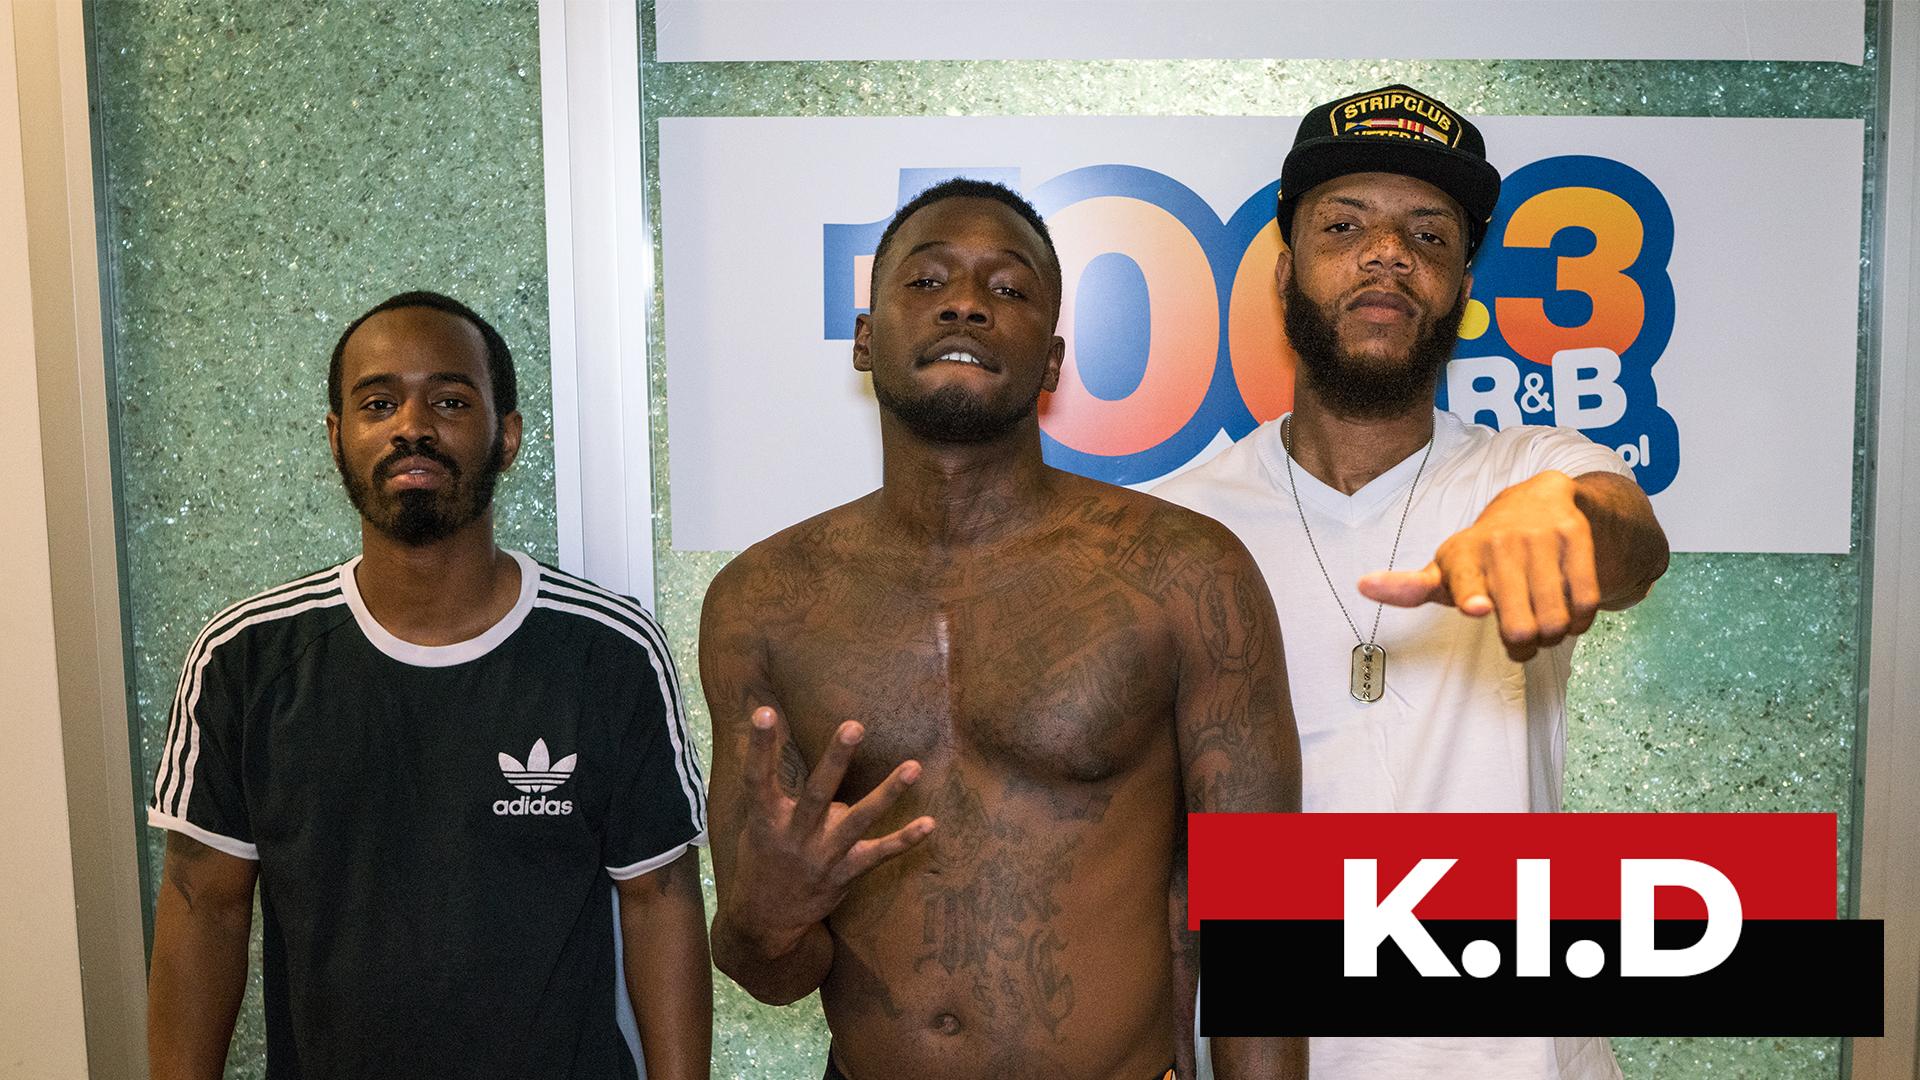 Freestyle Friday, K.I.D, The WIZ